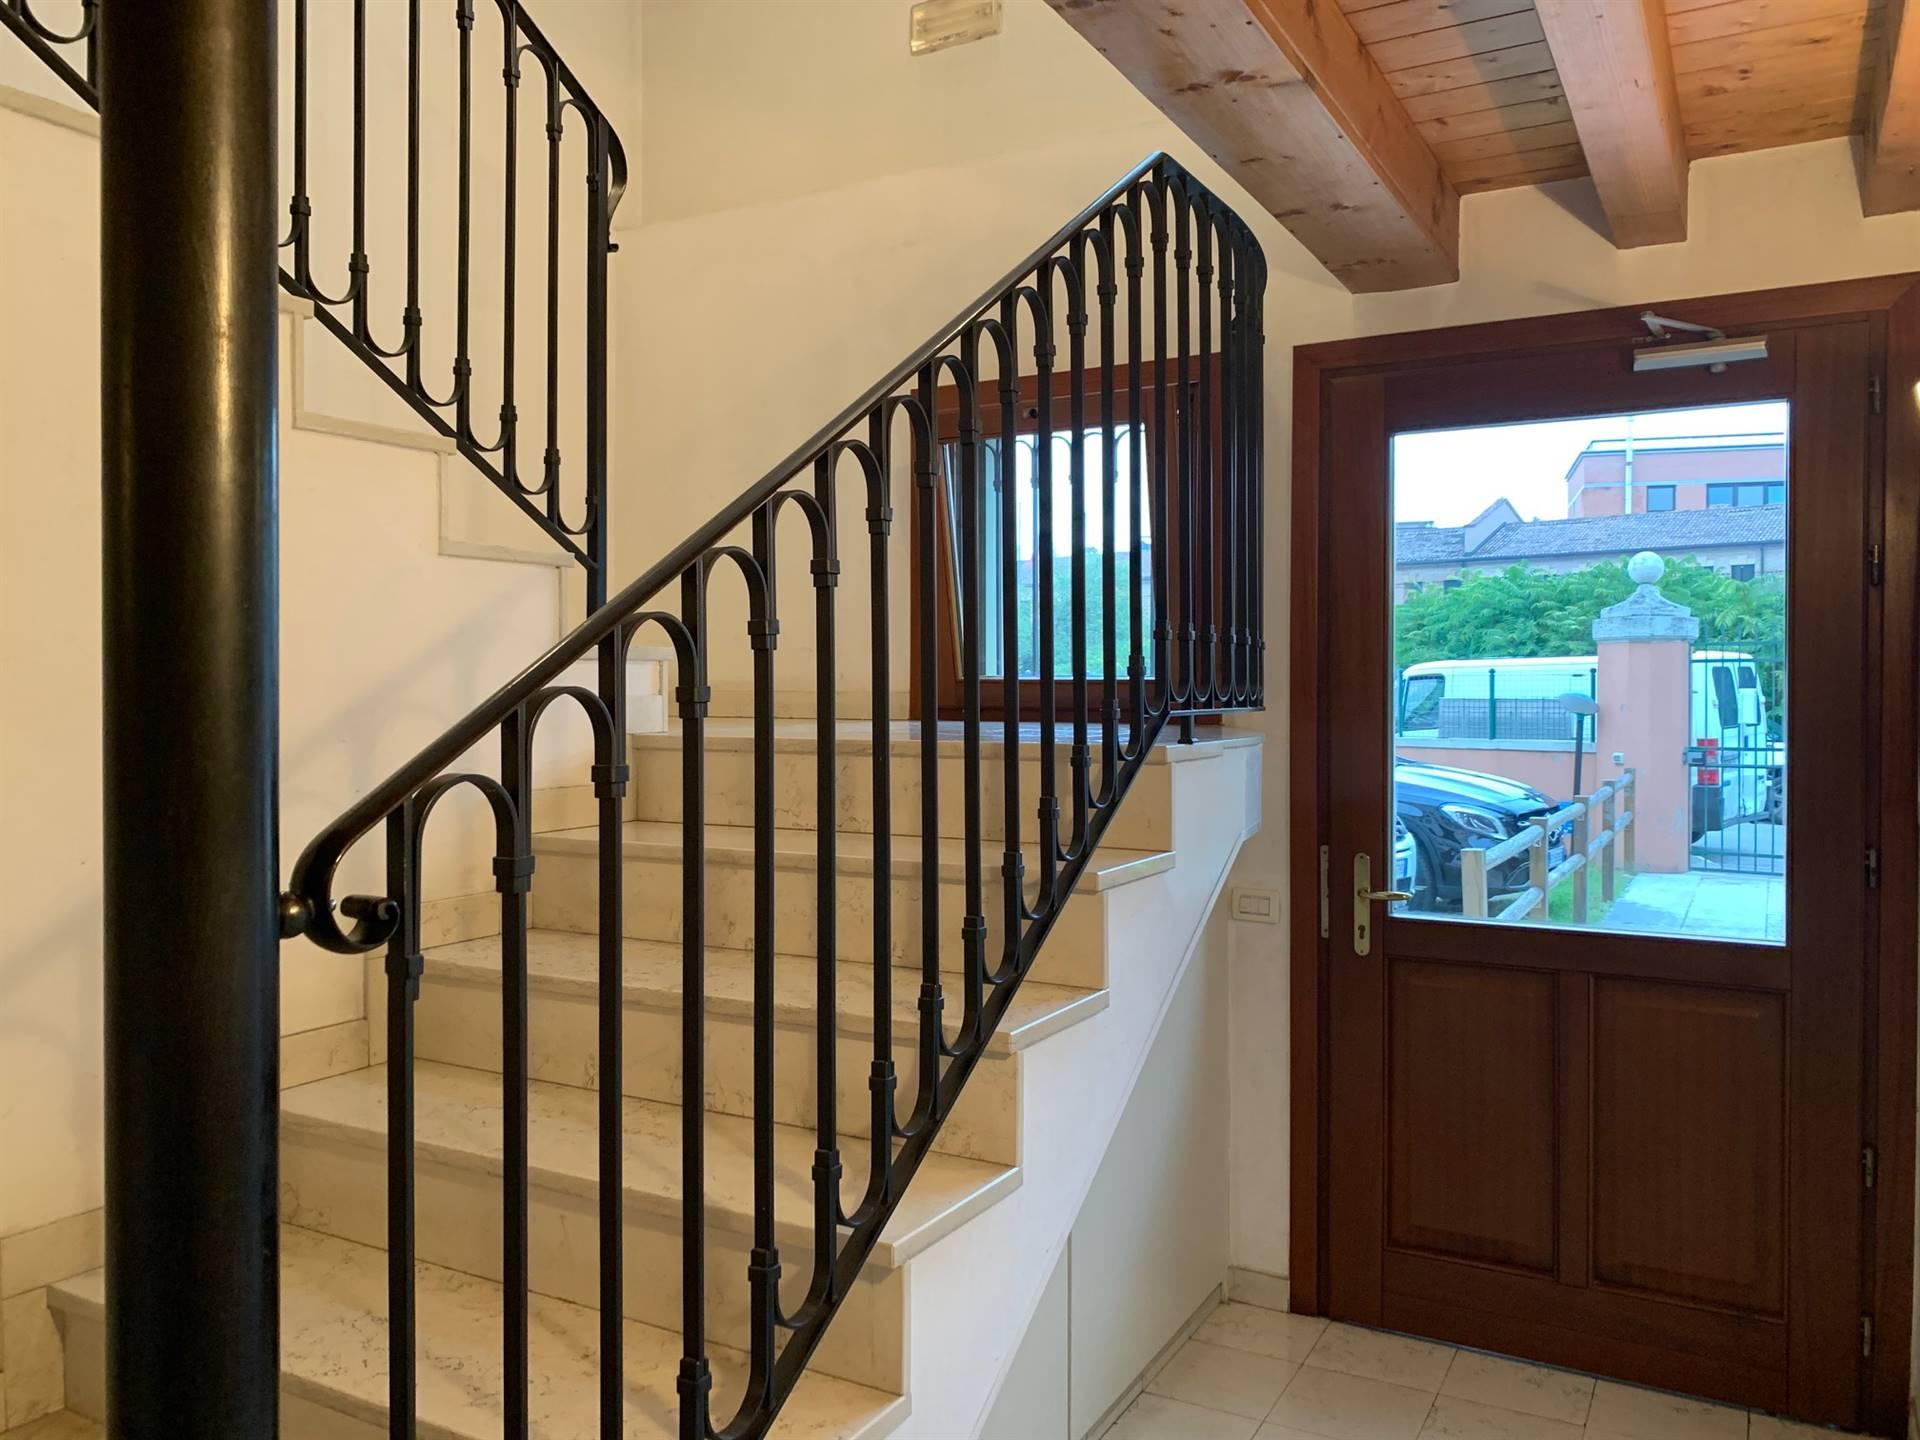 ingresso condominiale appartamento vendita Mestre